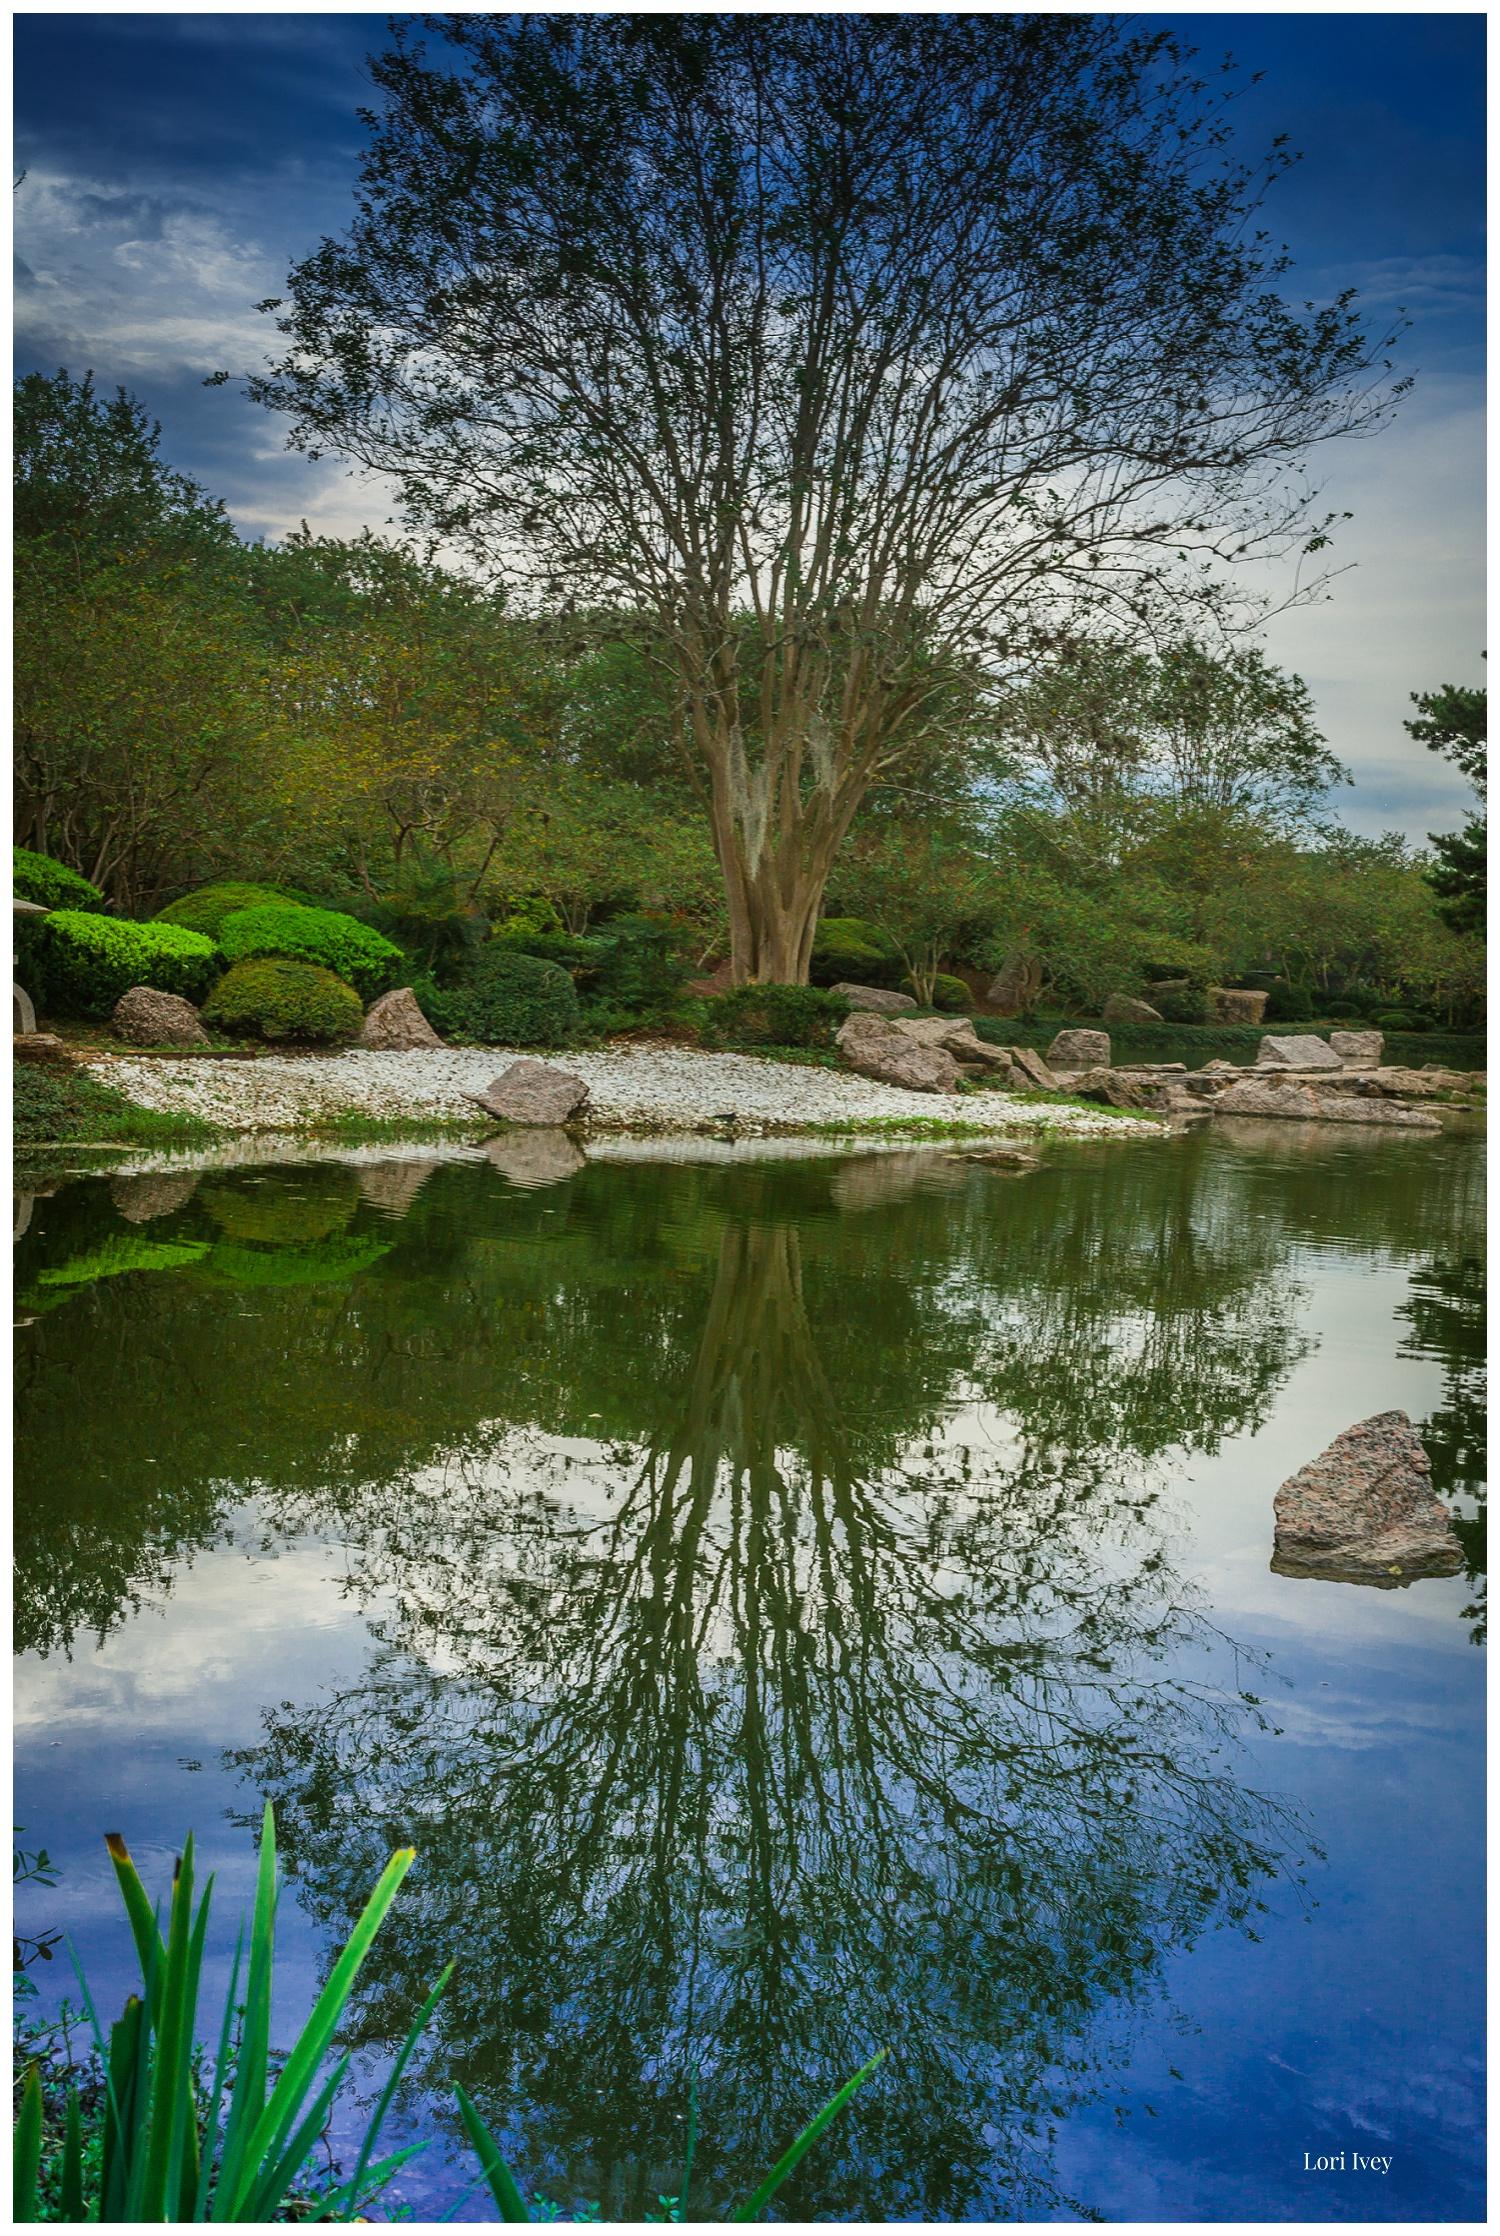 Reflected tree at koi pond at Japanese Gardens, Hermann Park